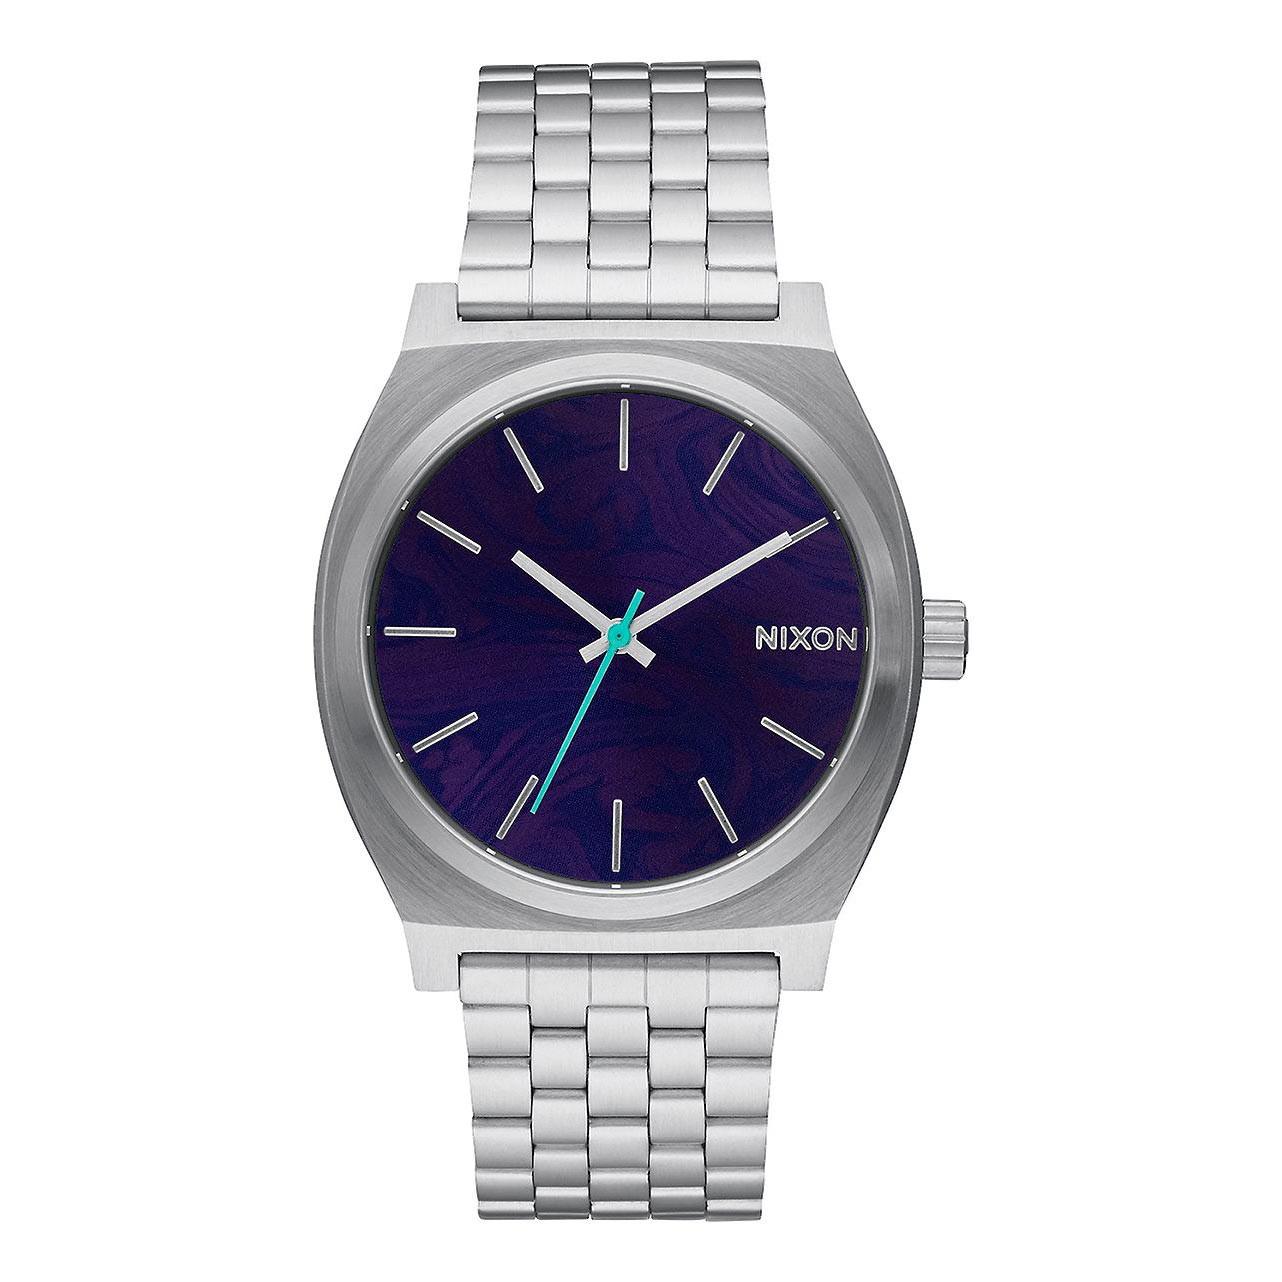 Hodinky Nixon Time Teller purple